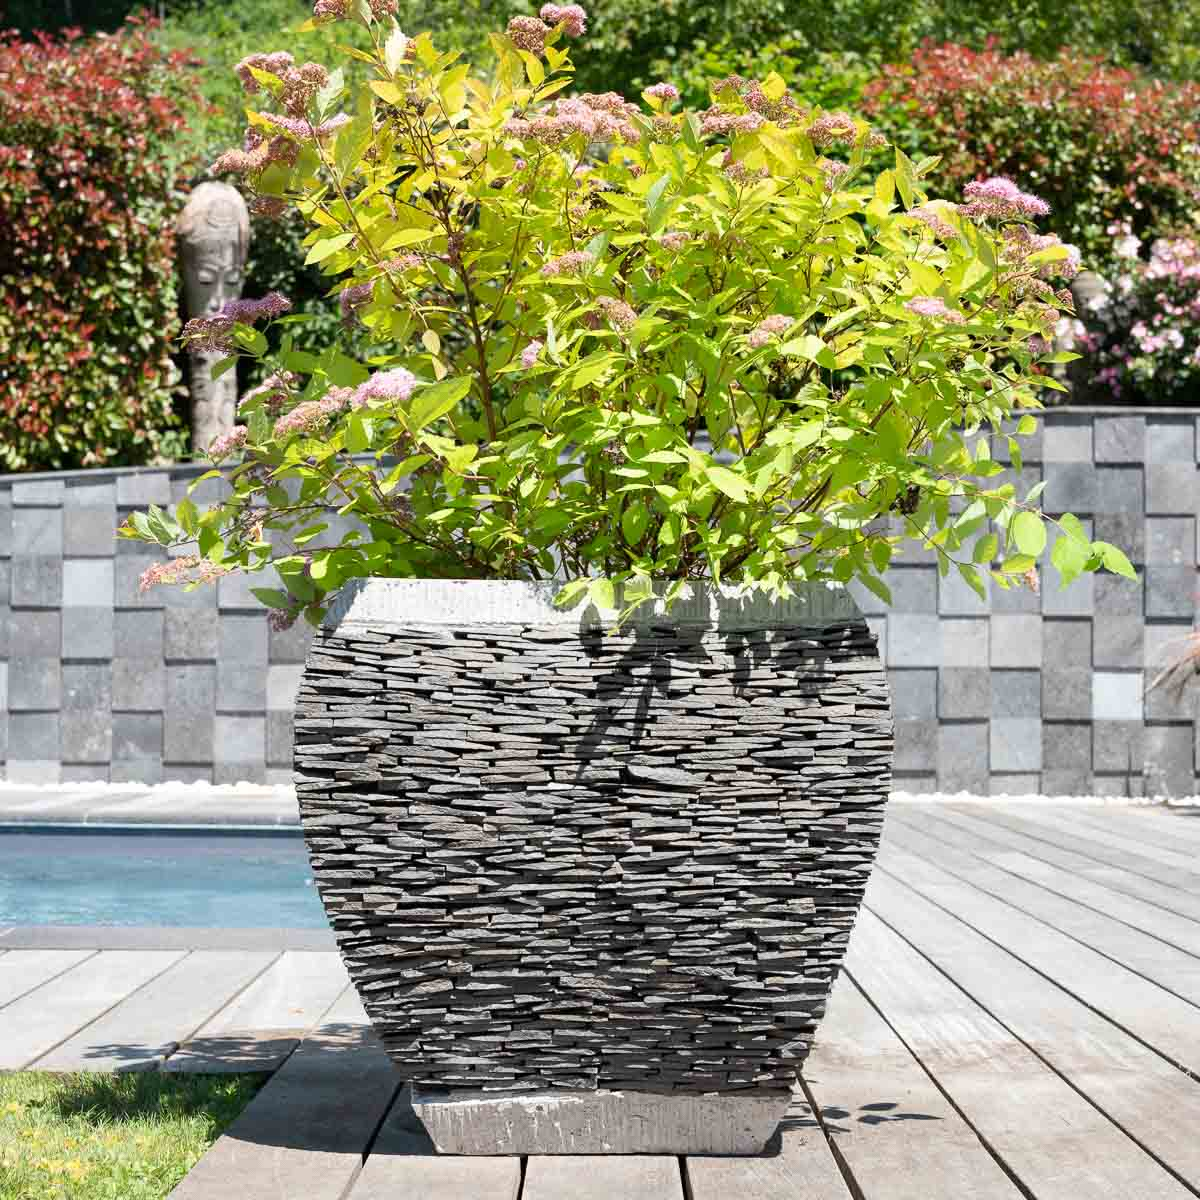 Maceta tiesto jardinera moldeada pizarra piedra natural for Jardineras de piedra natural